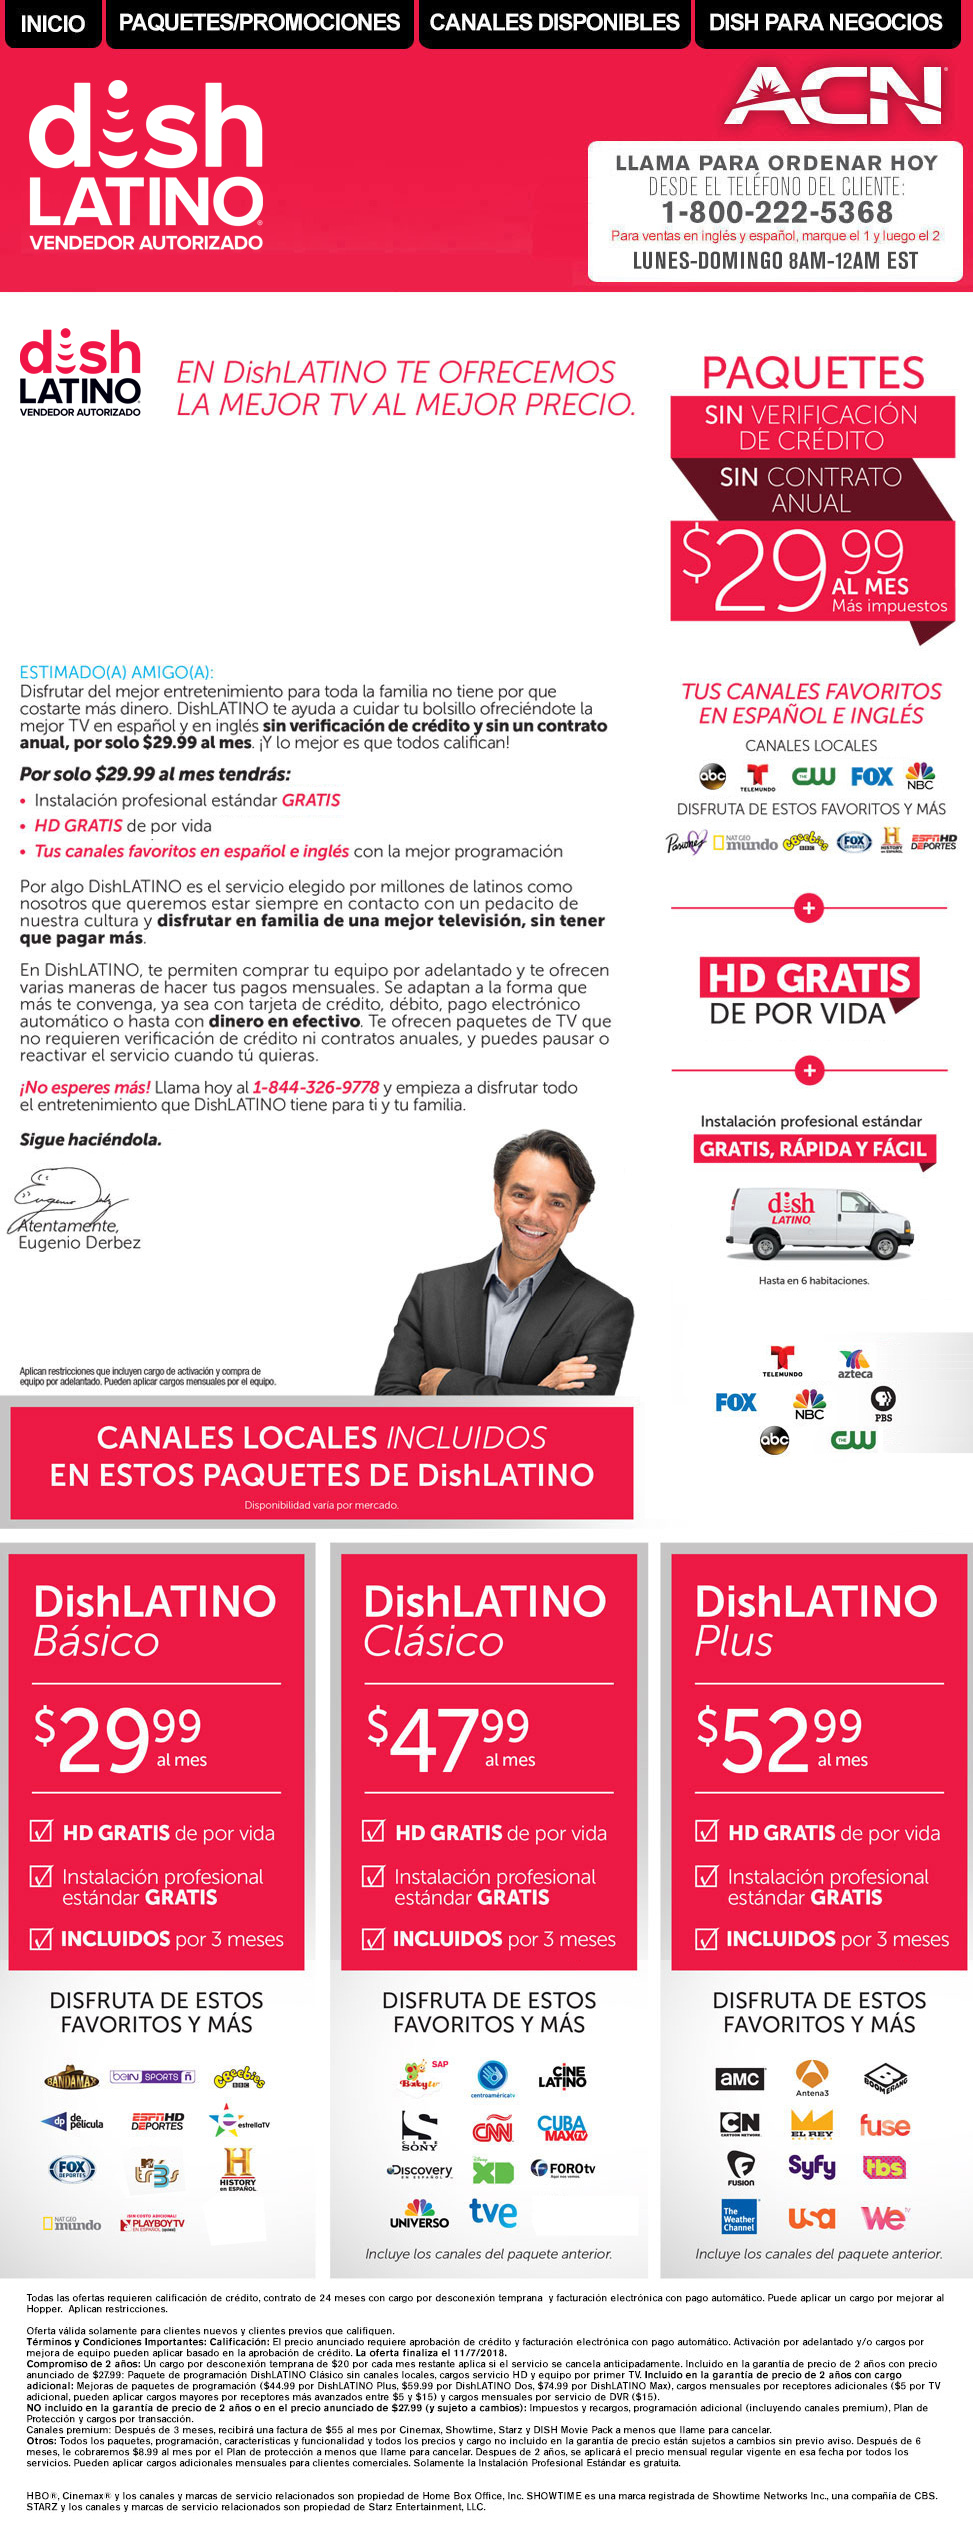 DISH Latino | 1-800-222-5368